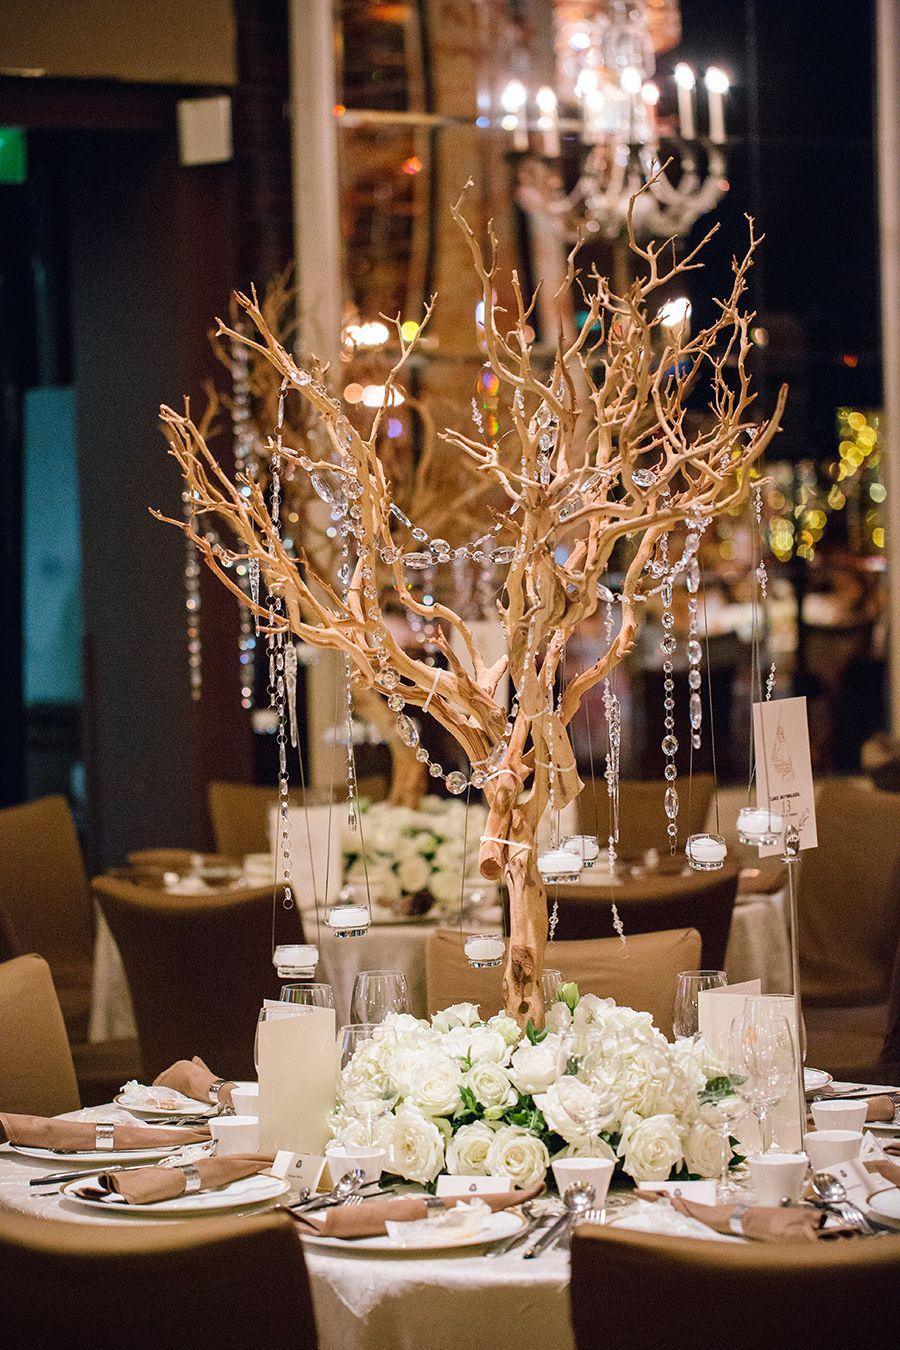 Shaoyi and tharas classy star wars wedding at st regis singapore gold wedding table decor inspiration shaoyi and tharas classy star wars wedding at st regis singapore junglespirit Choice Image